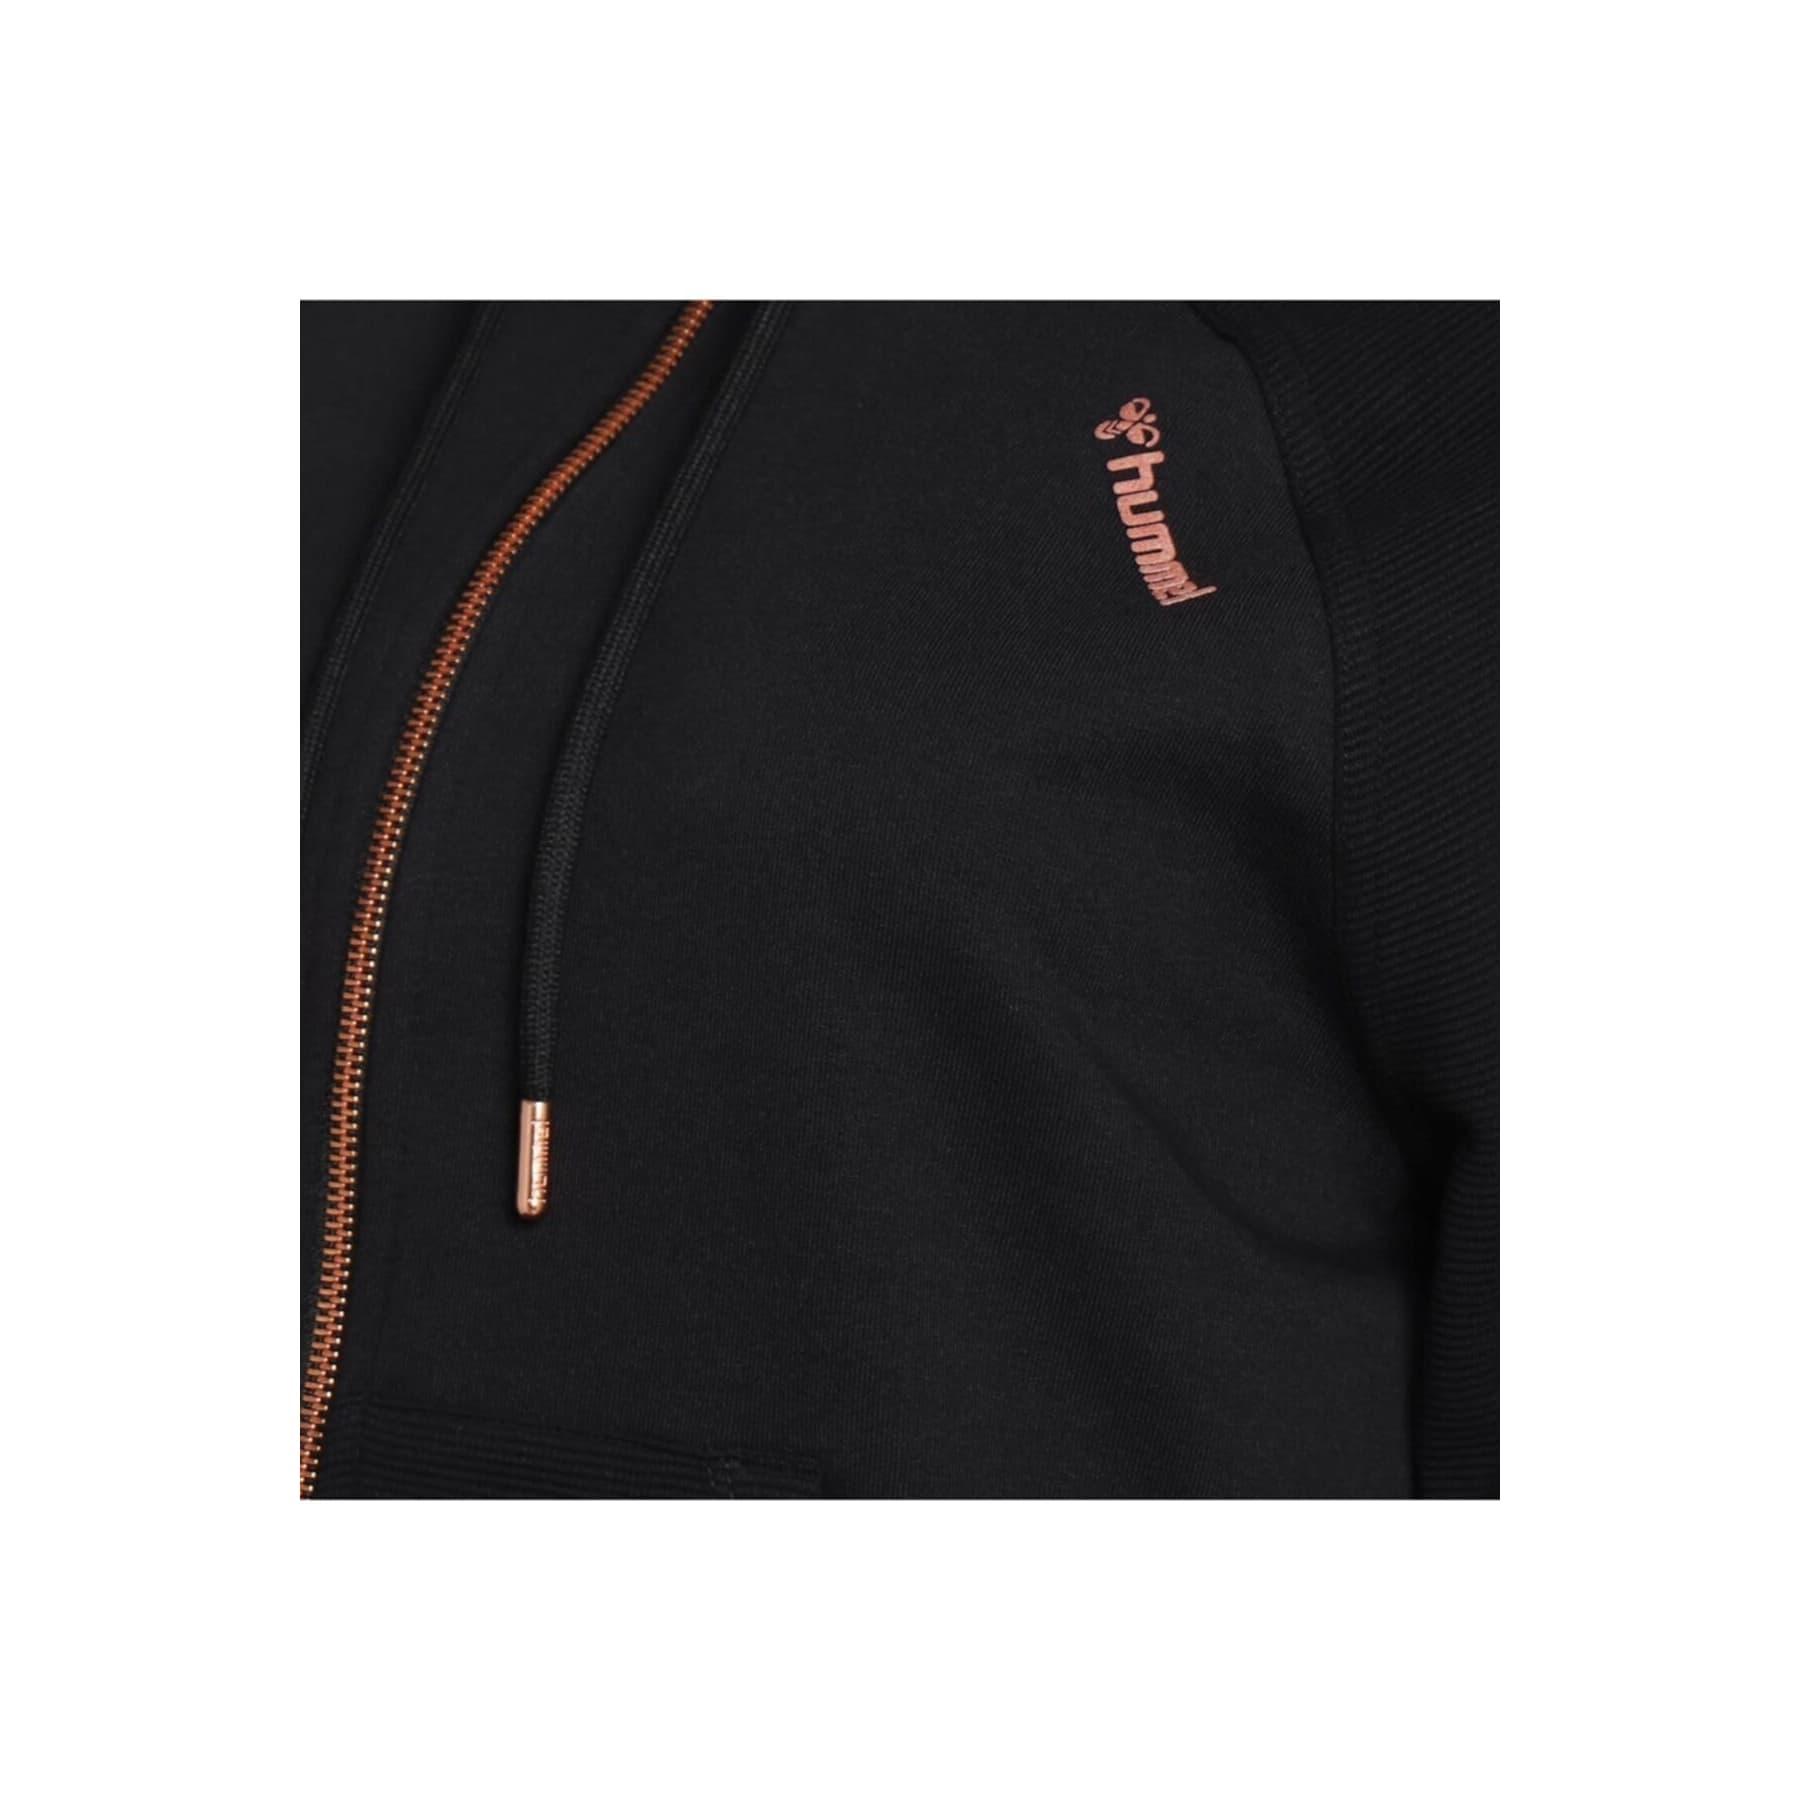 Dina Kadın Siyah Fermuarlı Sweatshirt (921238-2001)